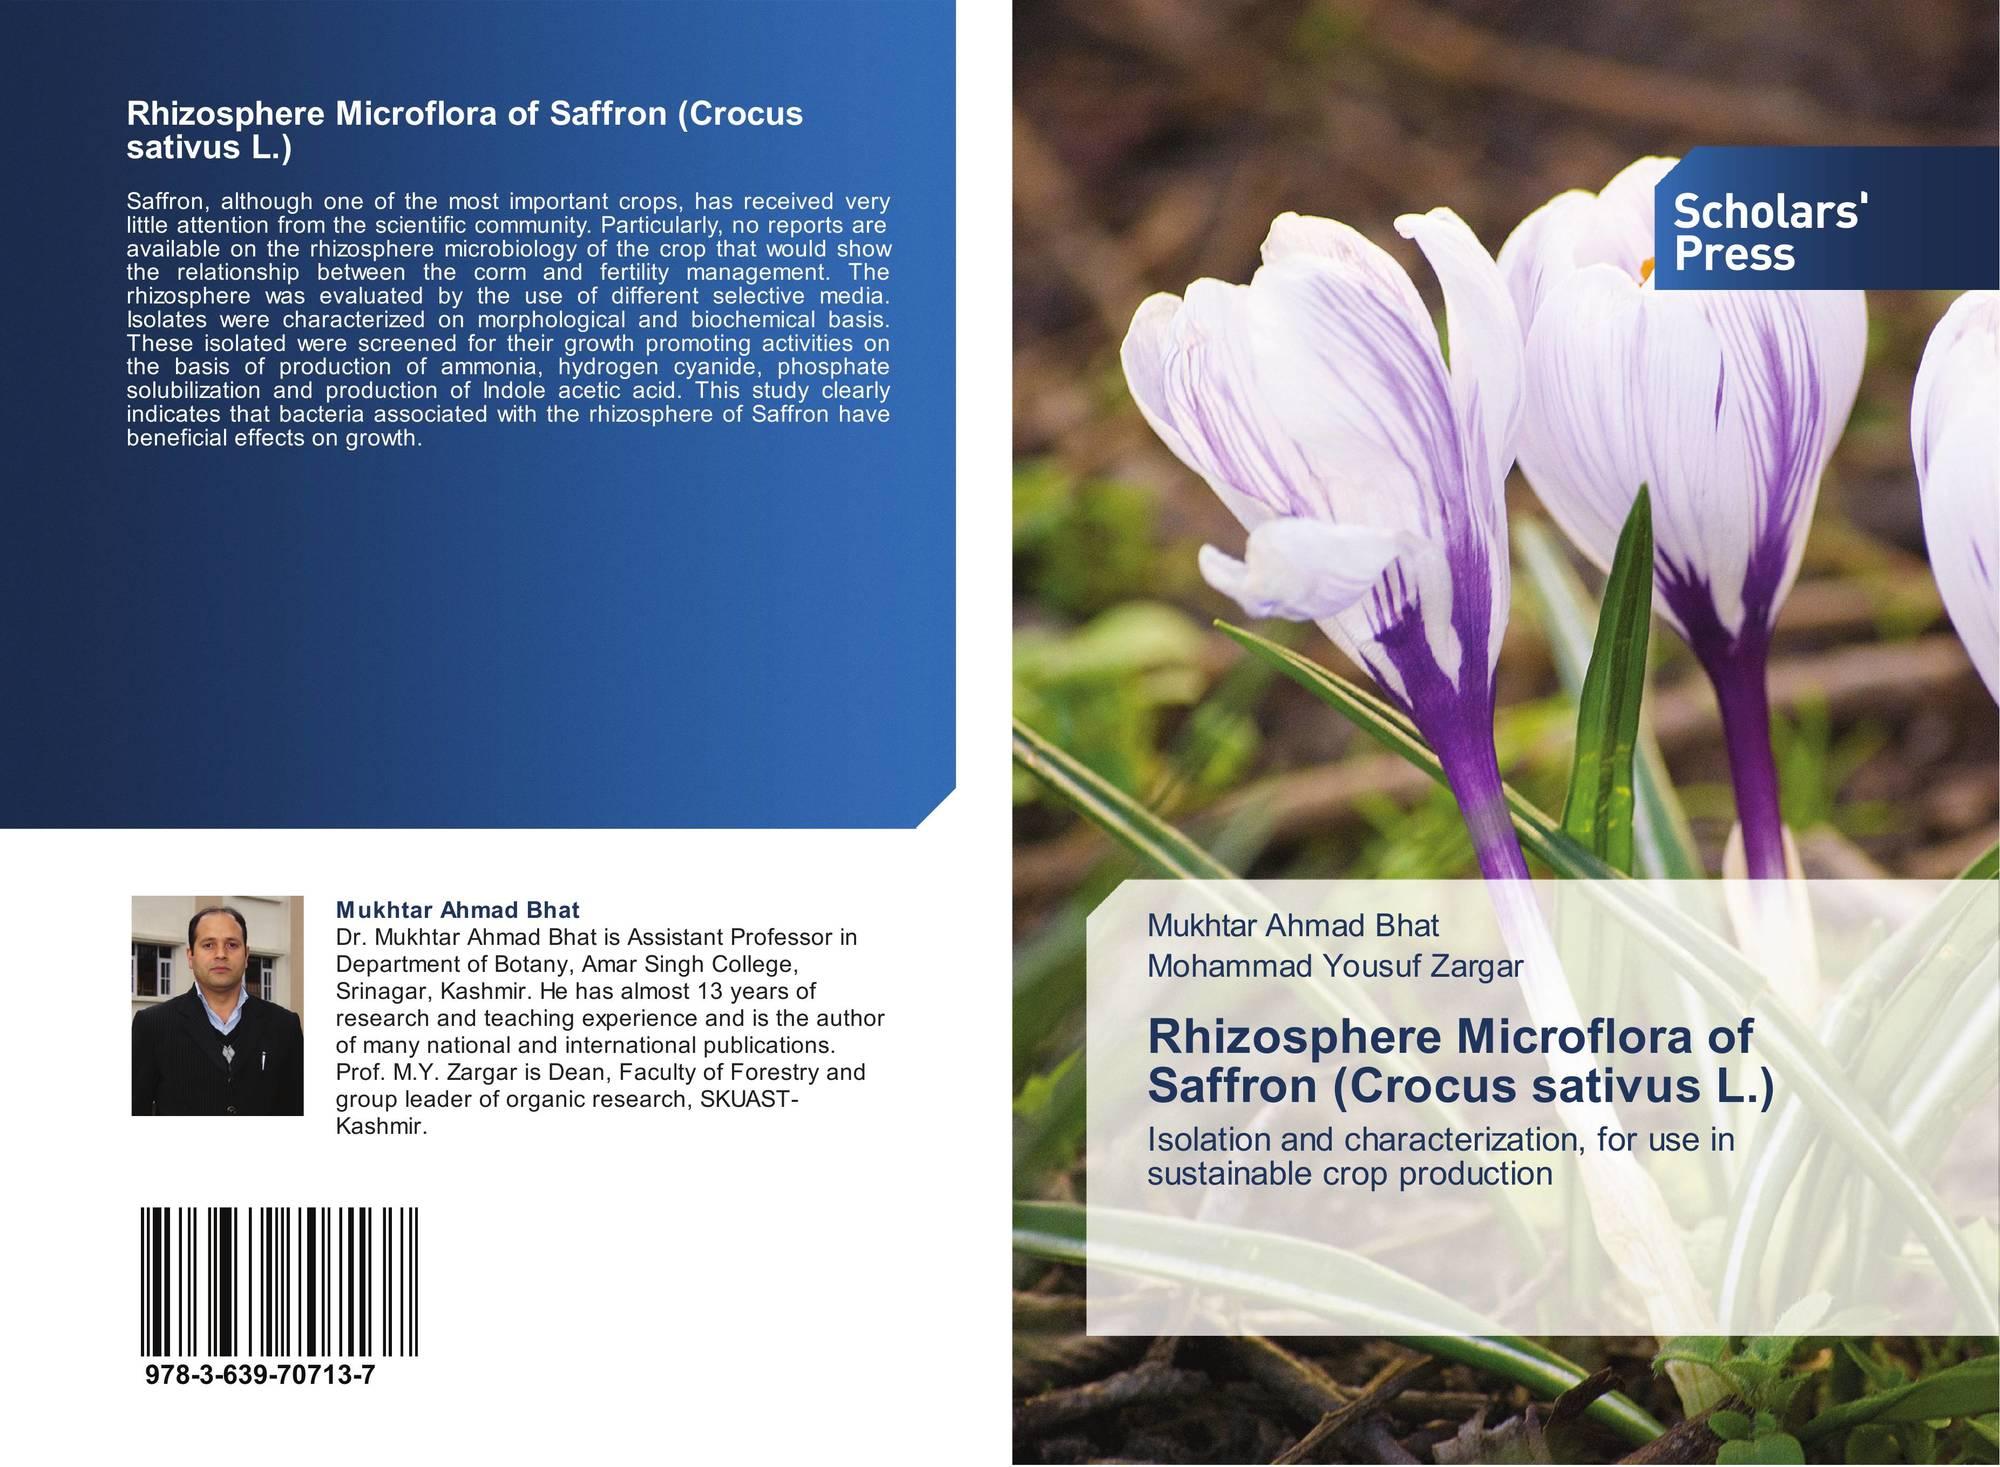 Rhizosphere Microflora of Saffron (Crocus sativus L ), 978-3-639